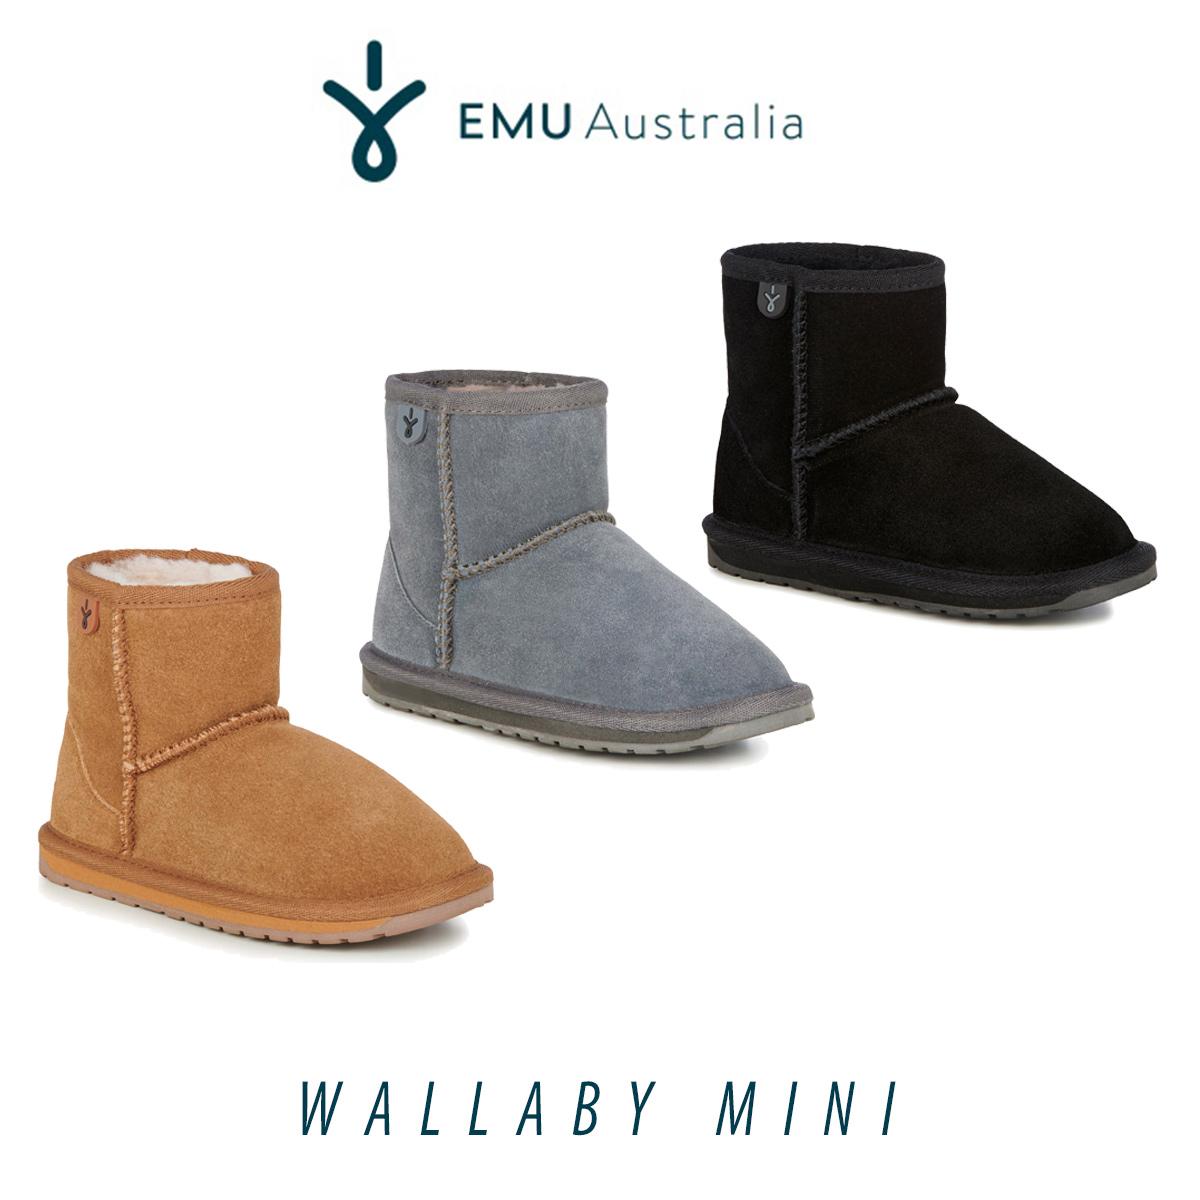 EMU Australia Wallaby Mini Ankle Boots